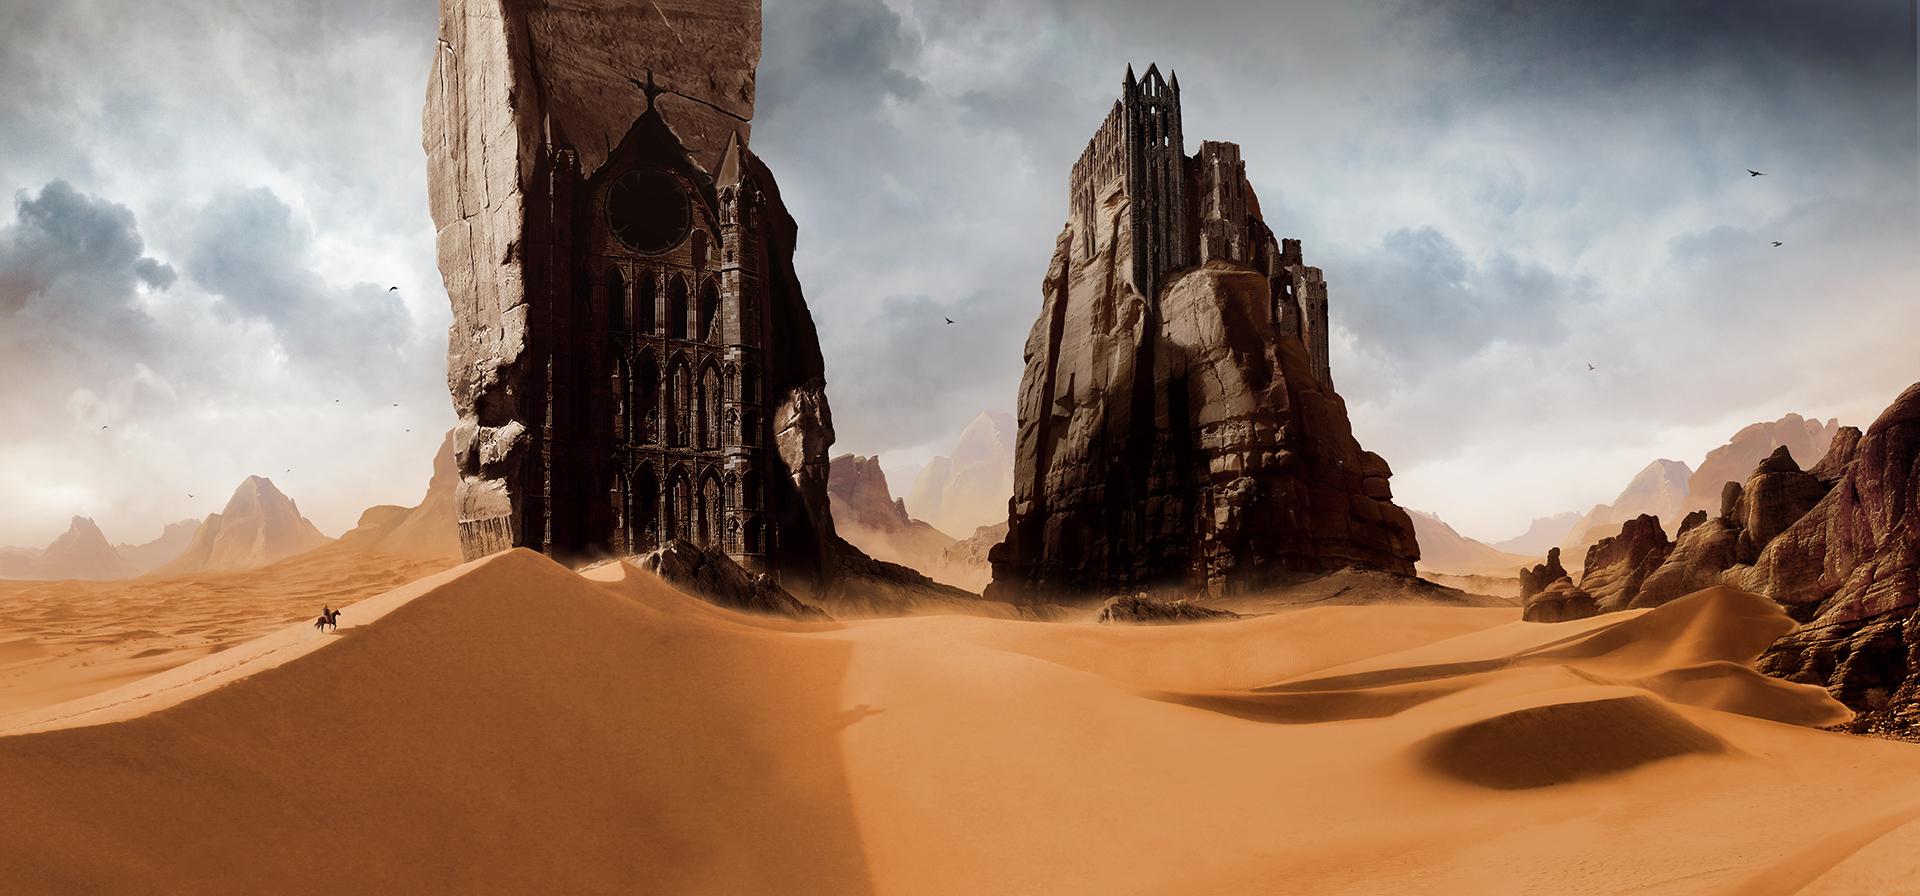 Sand Castle by polaus